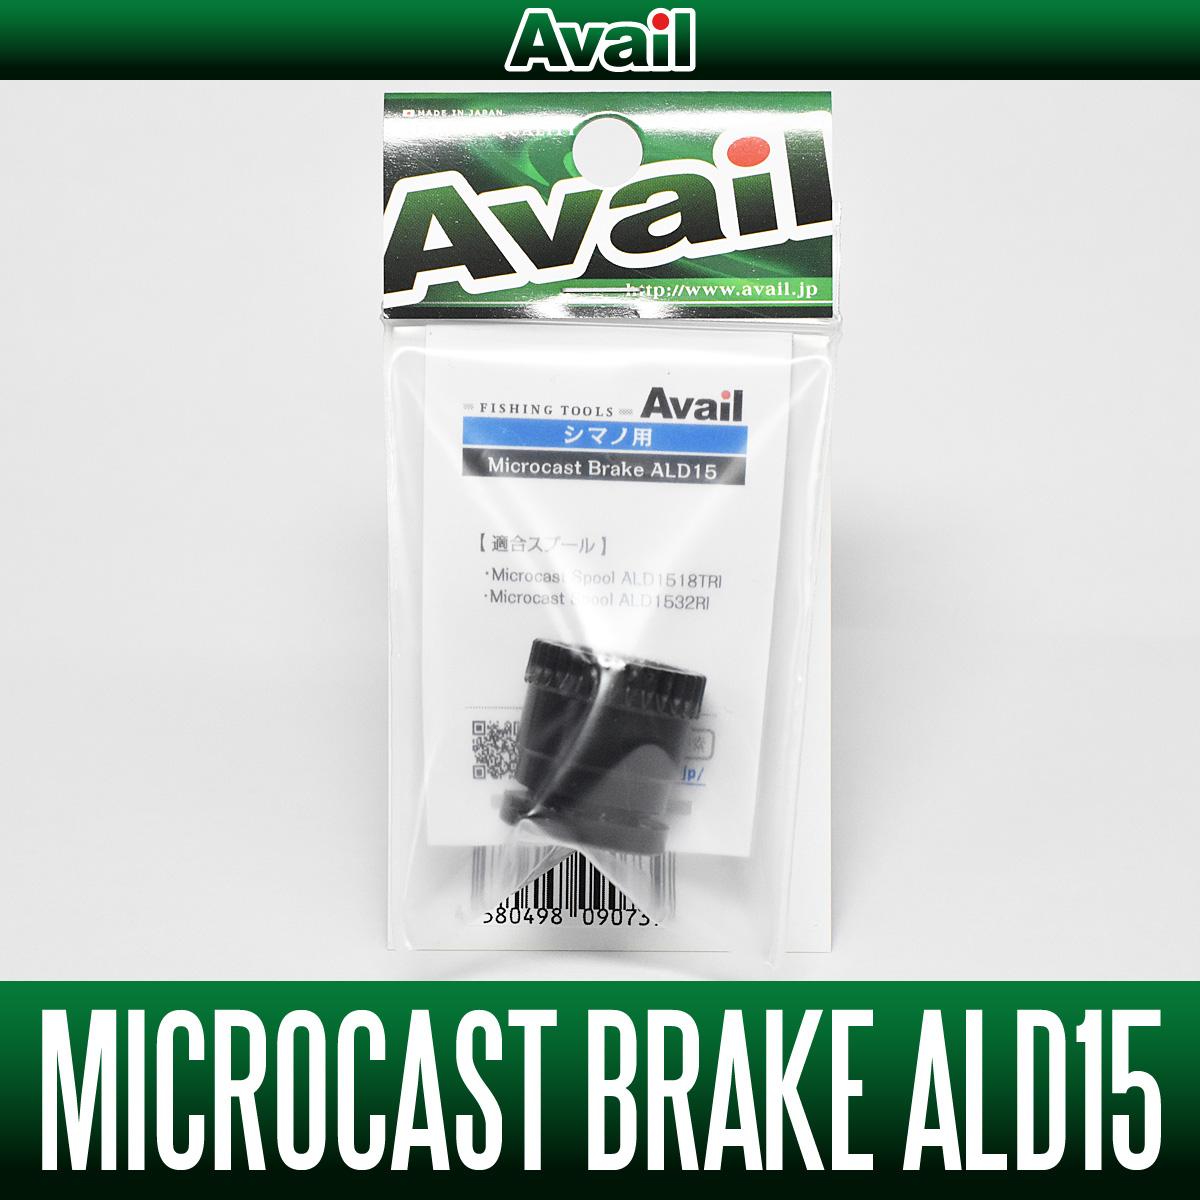 Avail Microcast Brake ALD15